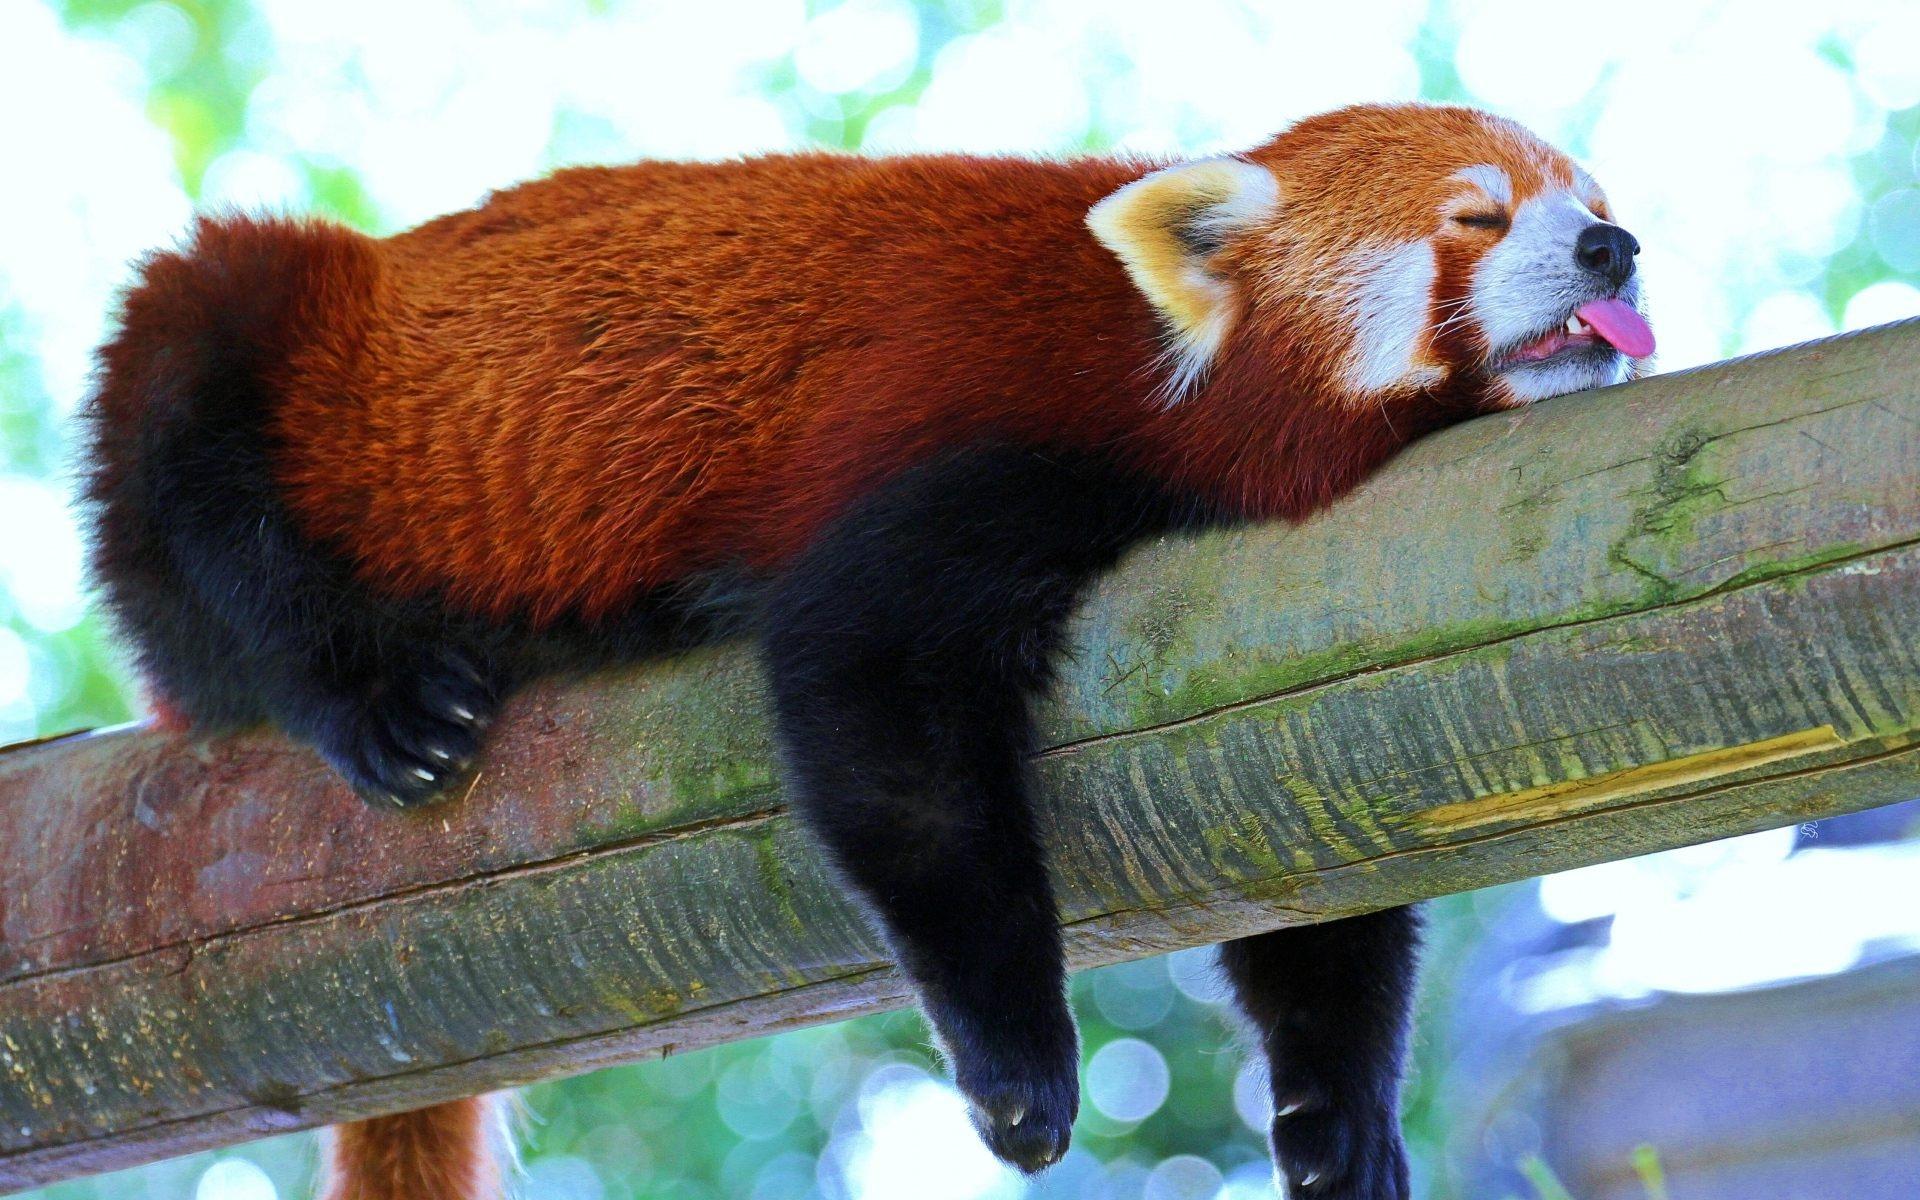 Sleeping bear funny looks image - Get HD Wallpapers Free